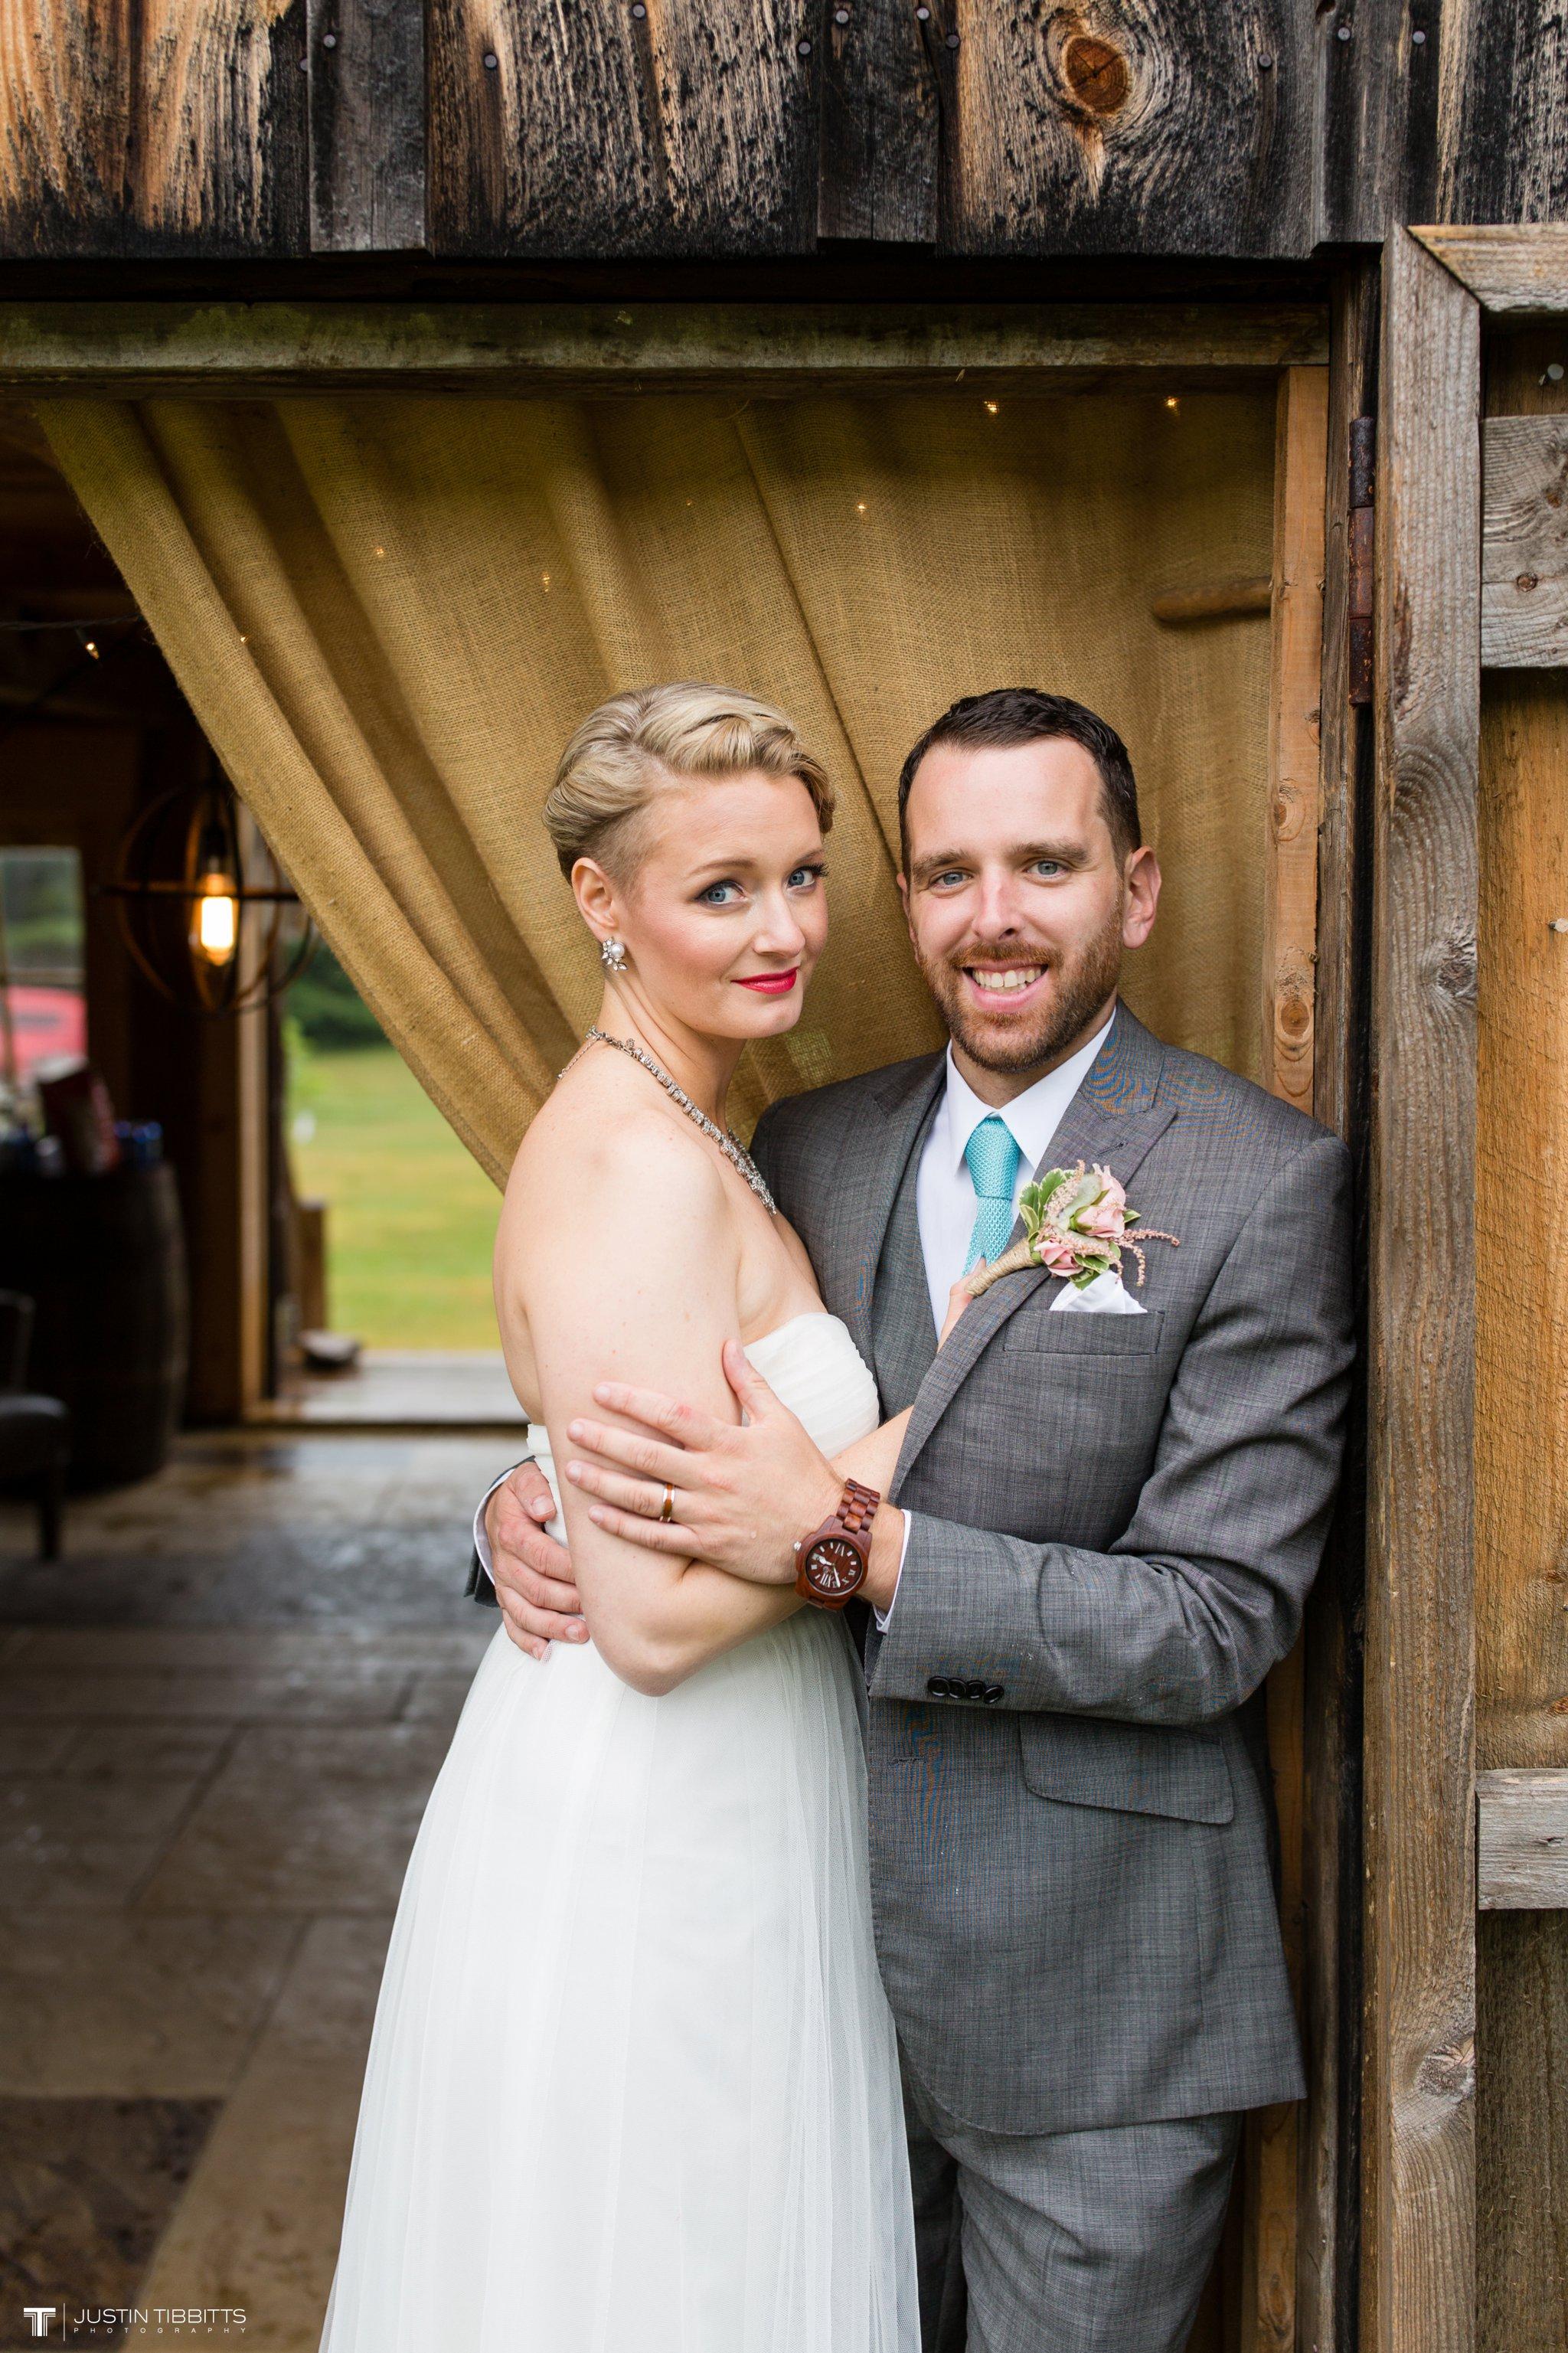 burlap-and-beams-wedding-photos-with-joran-and-molly_0096